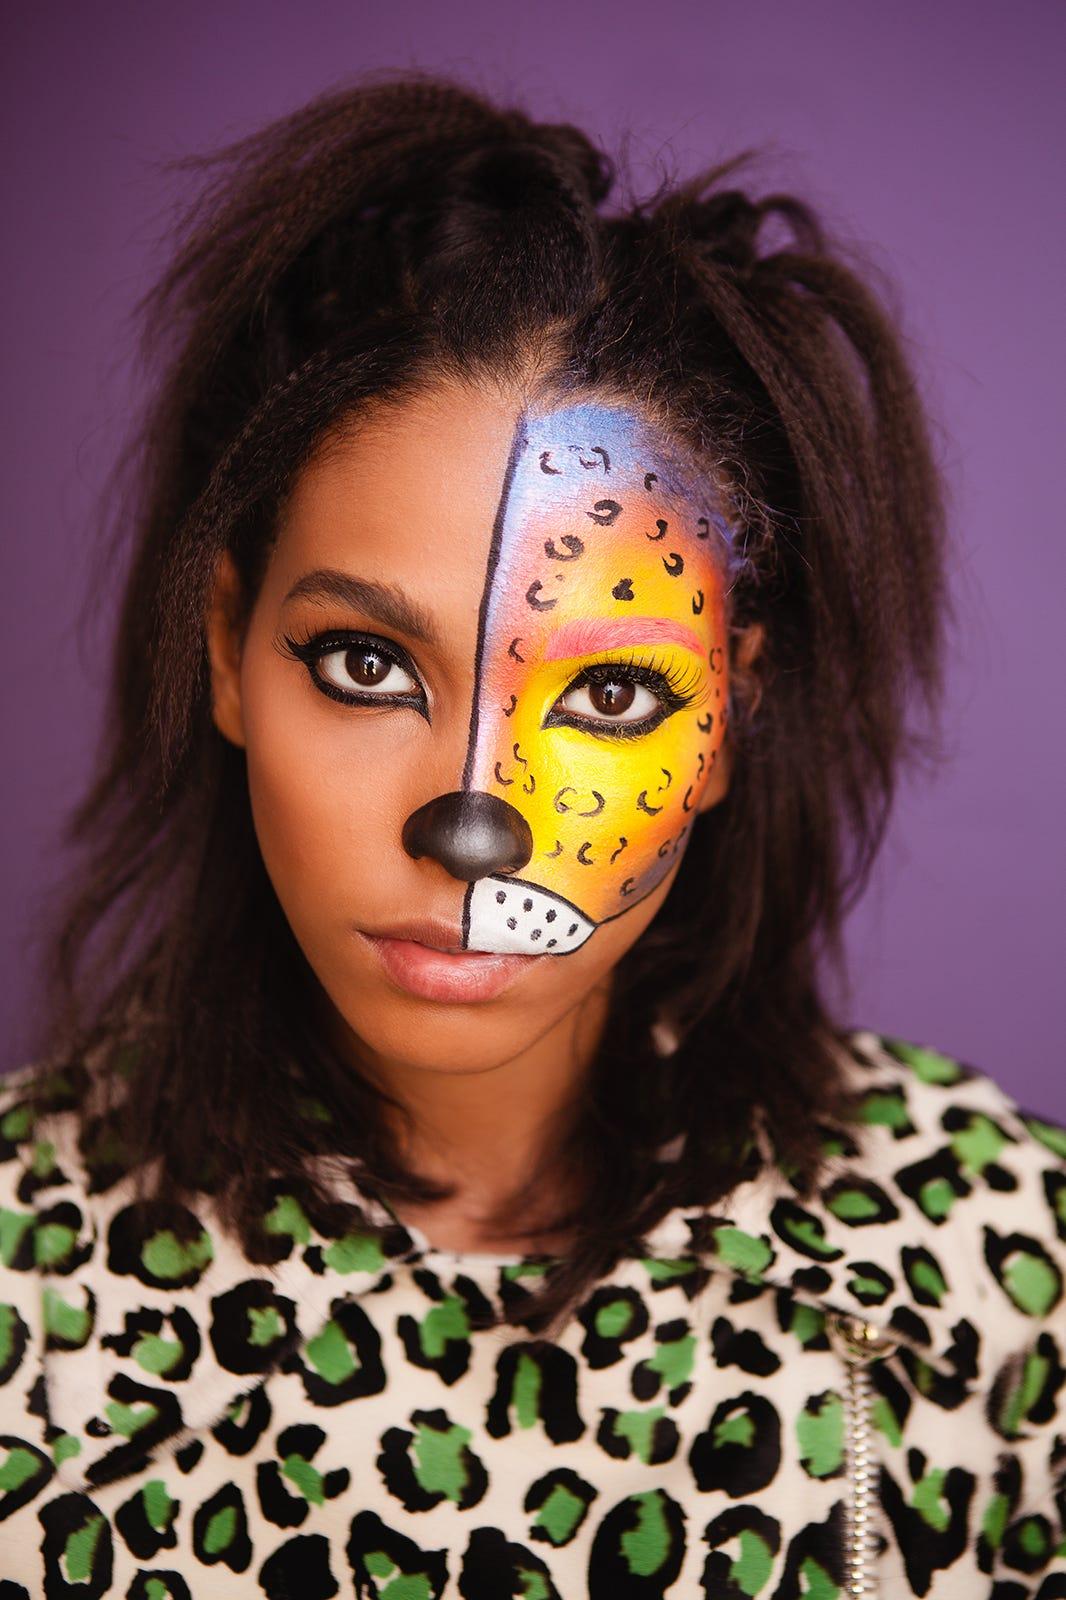 diy halloween makeup snapchat dog filter lisa frank - Halloween Costumes You Already Own